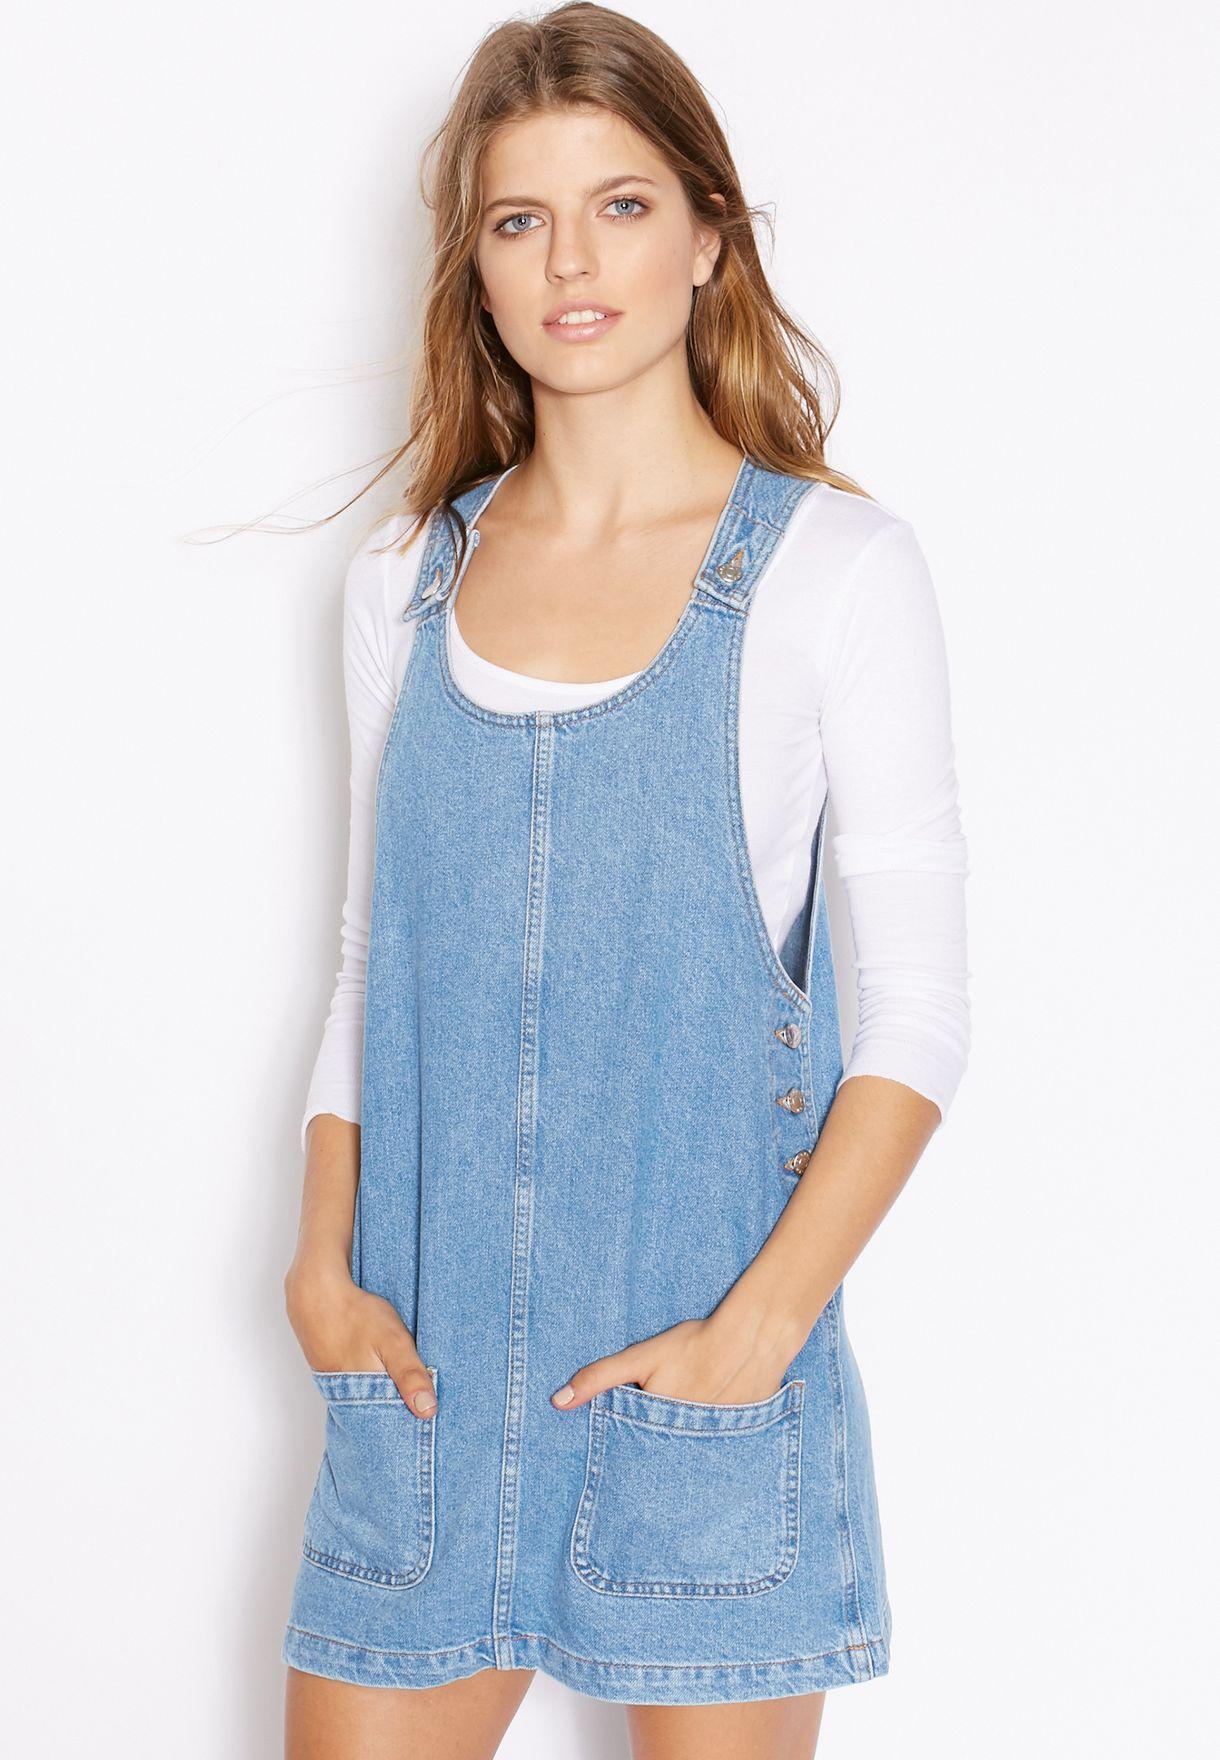 390501ccb777d Shop Topshop blue MOTO Denim Pinafore Dress 05G75JMDT for Women in ...